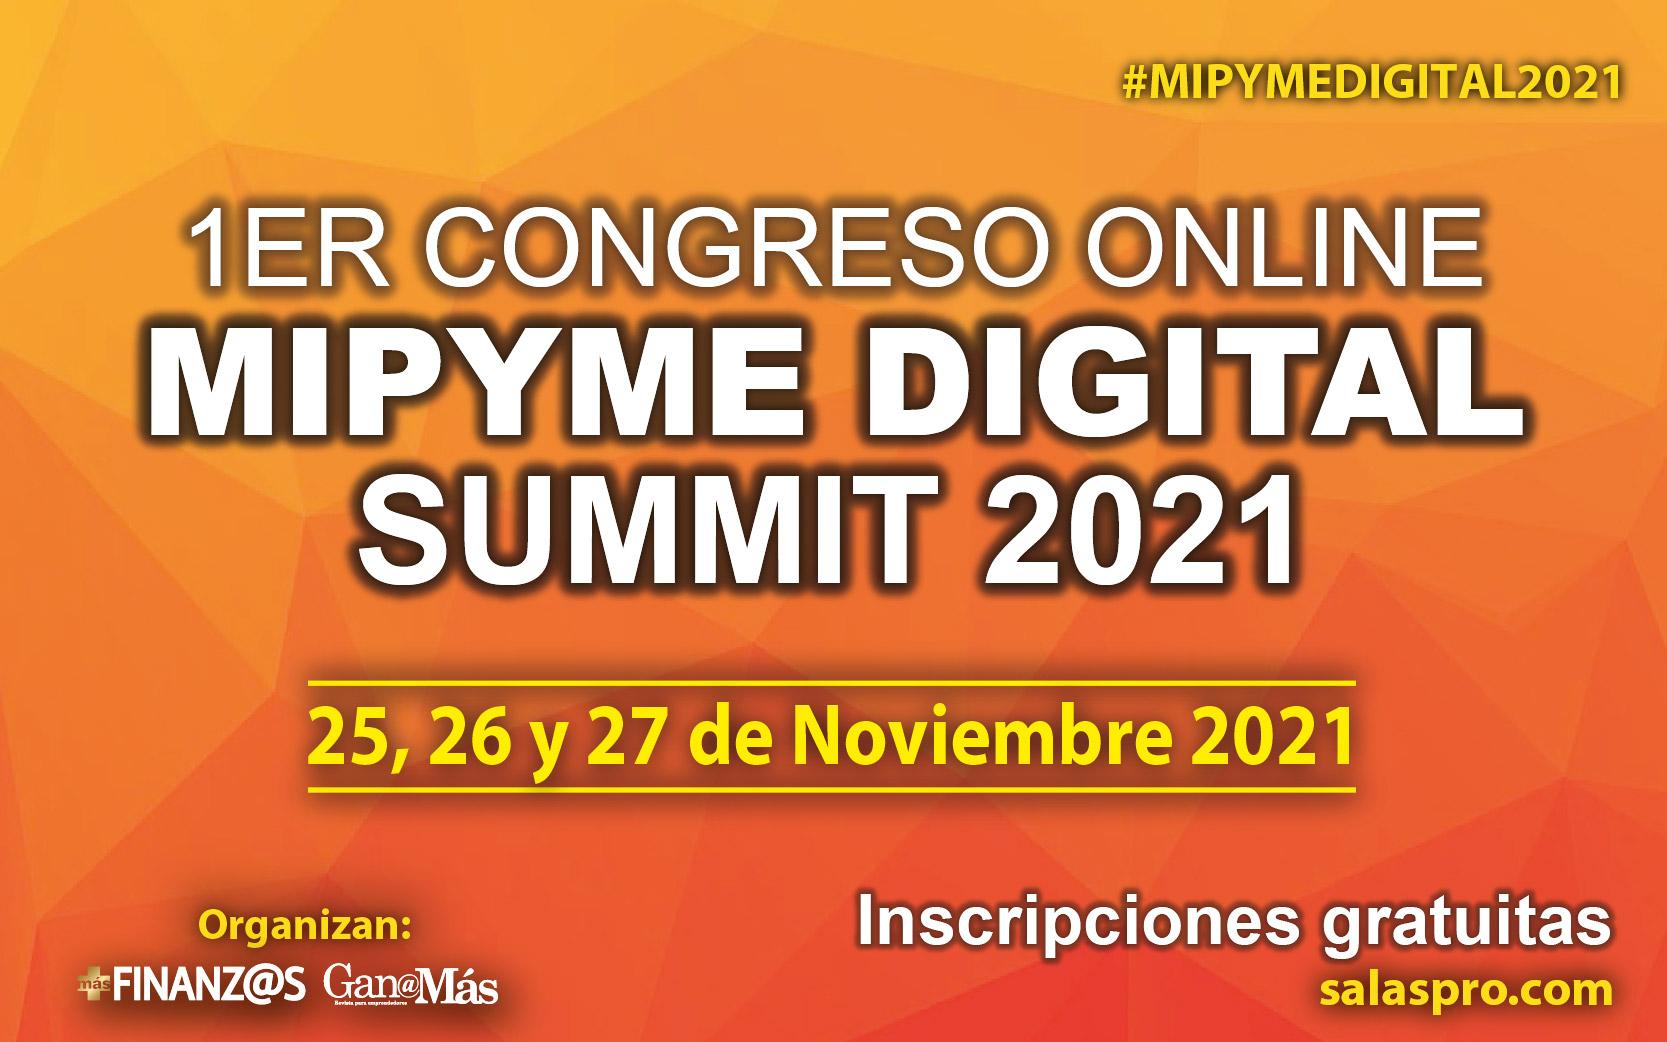 1er Congreso Mipyme Digital Summit 2021